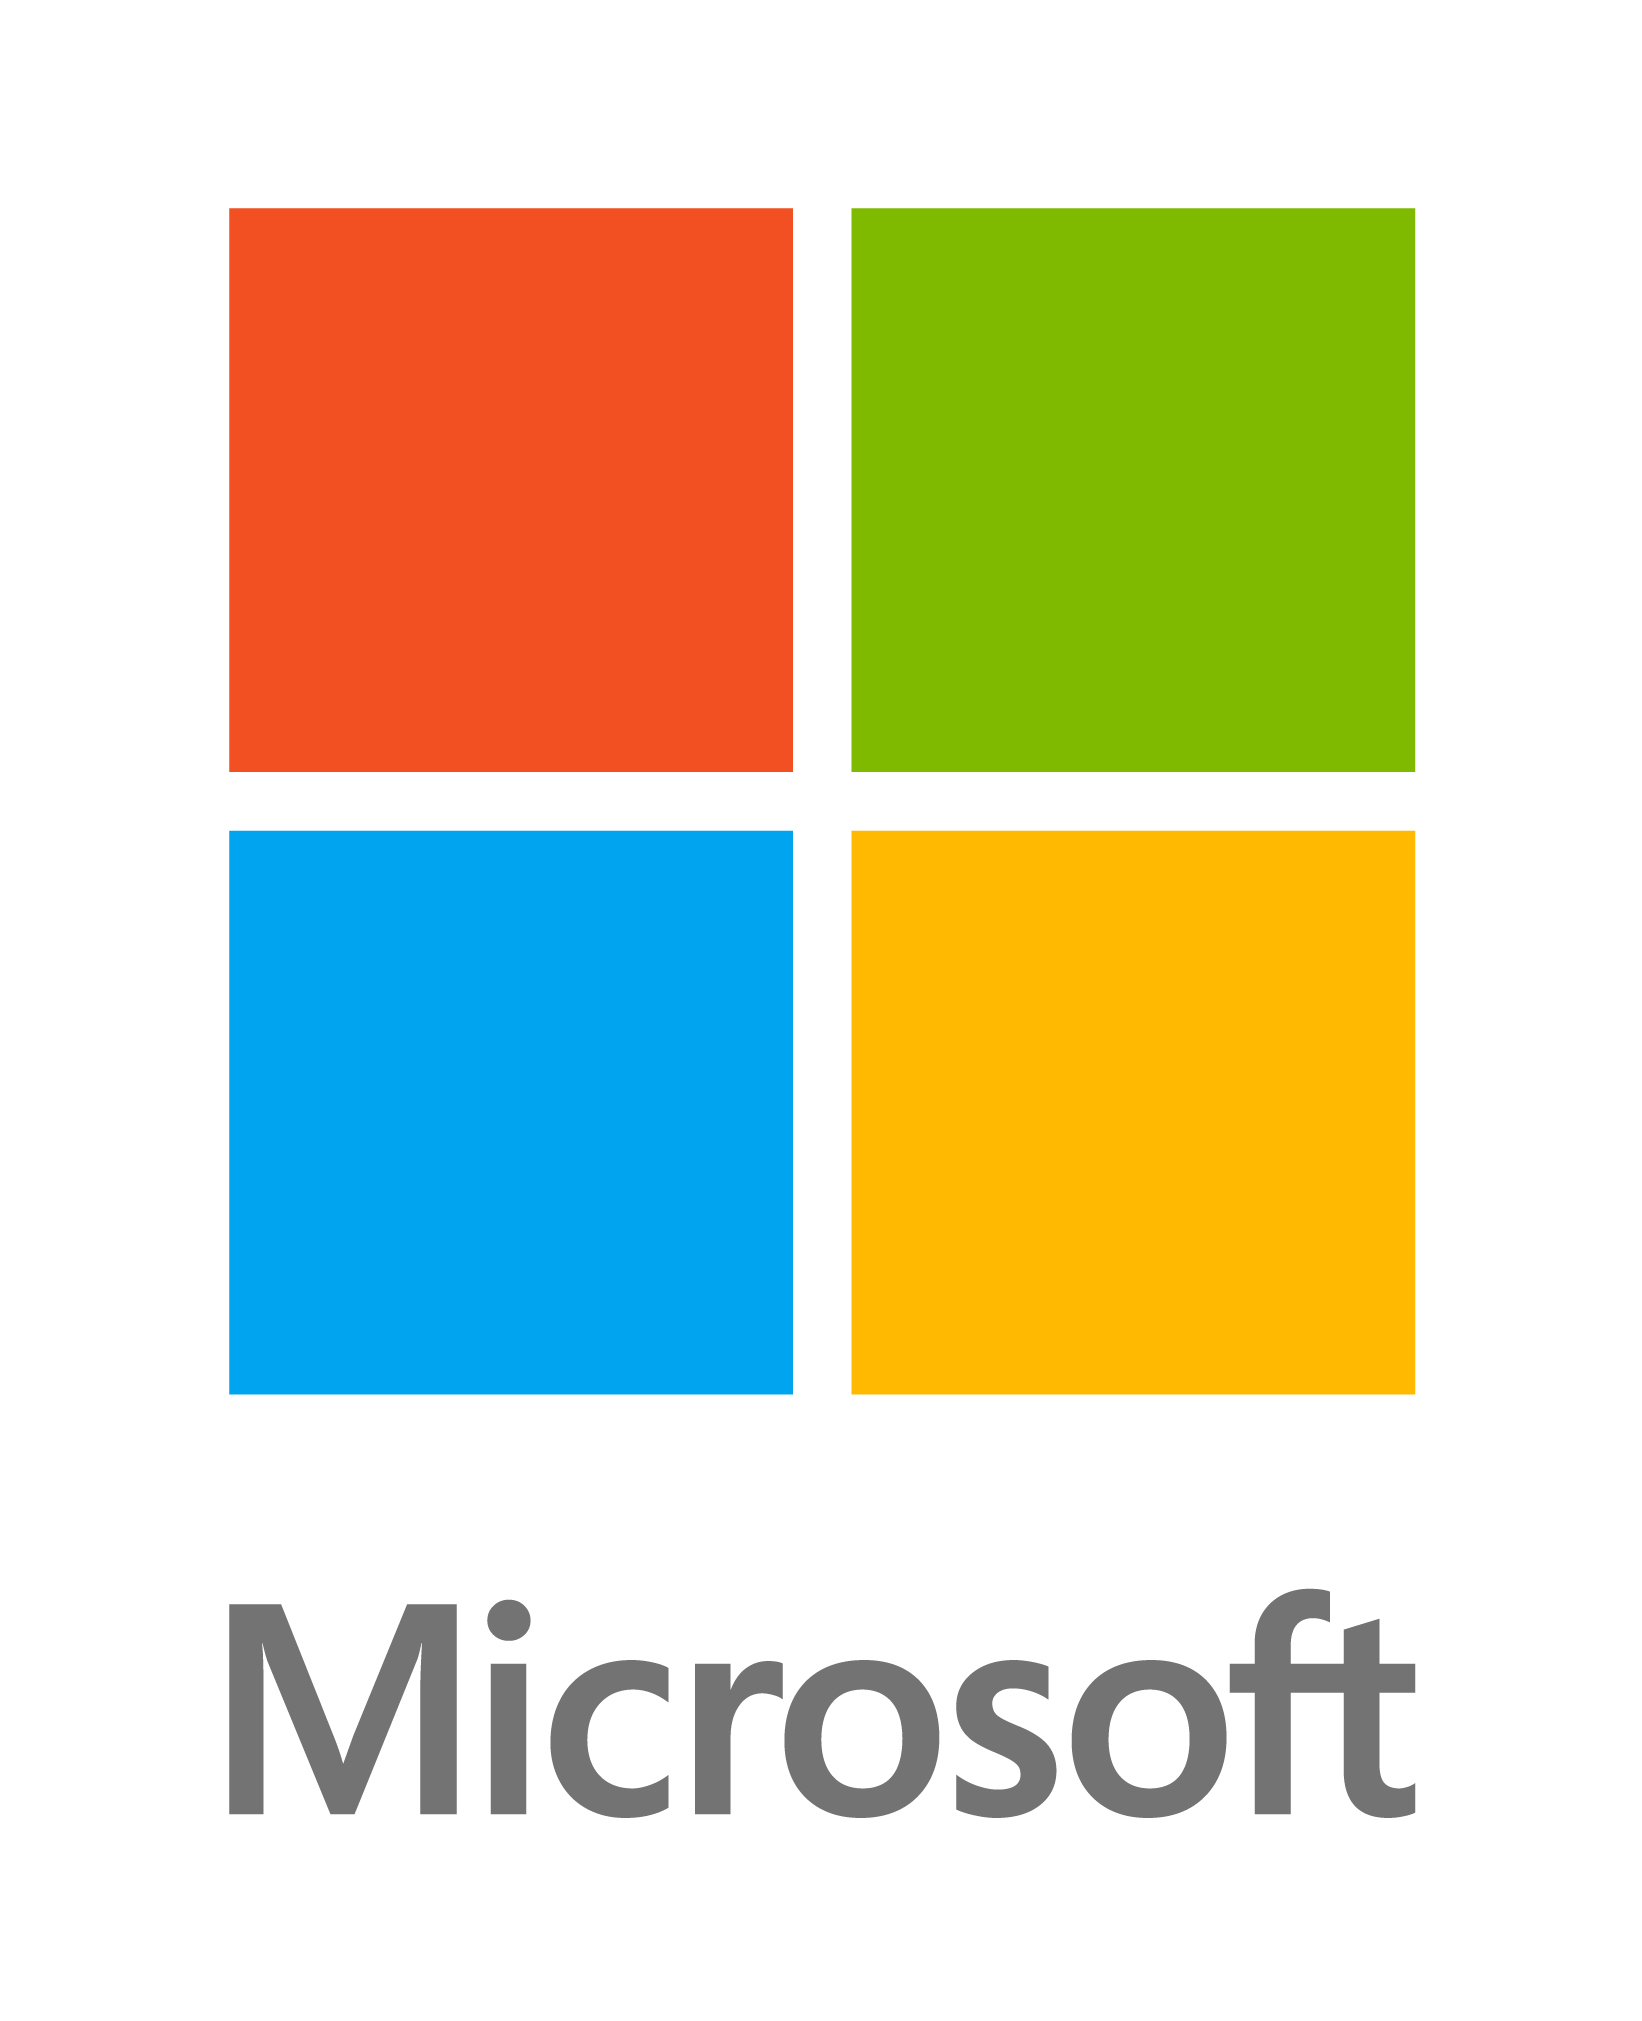 MSFT_logo_0.jpg